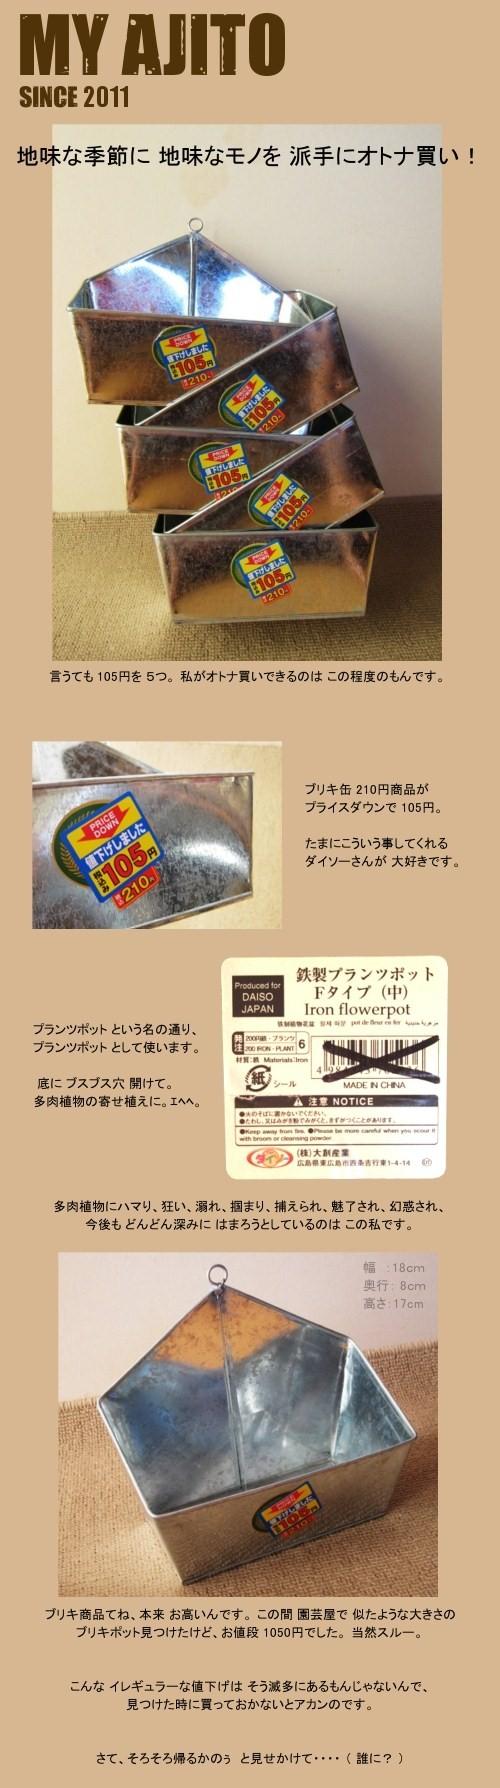 TSUYU_3.jpg